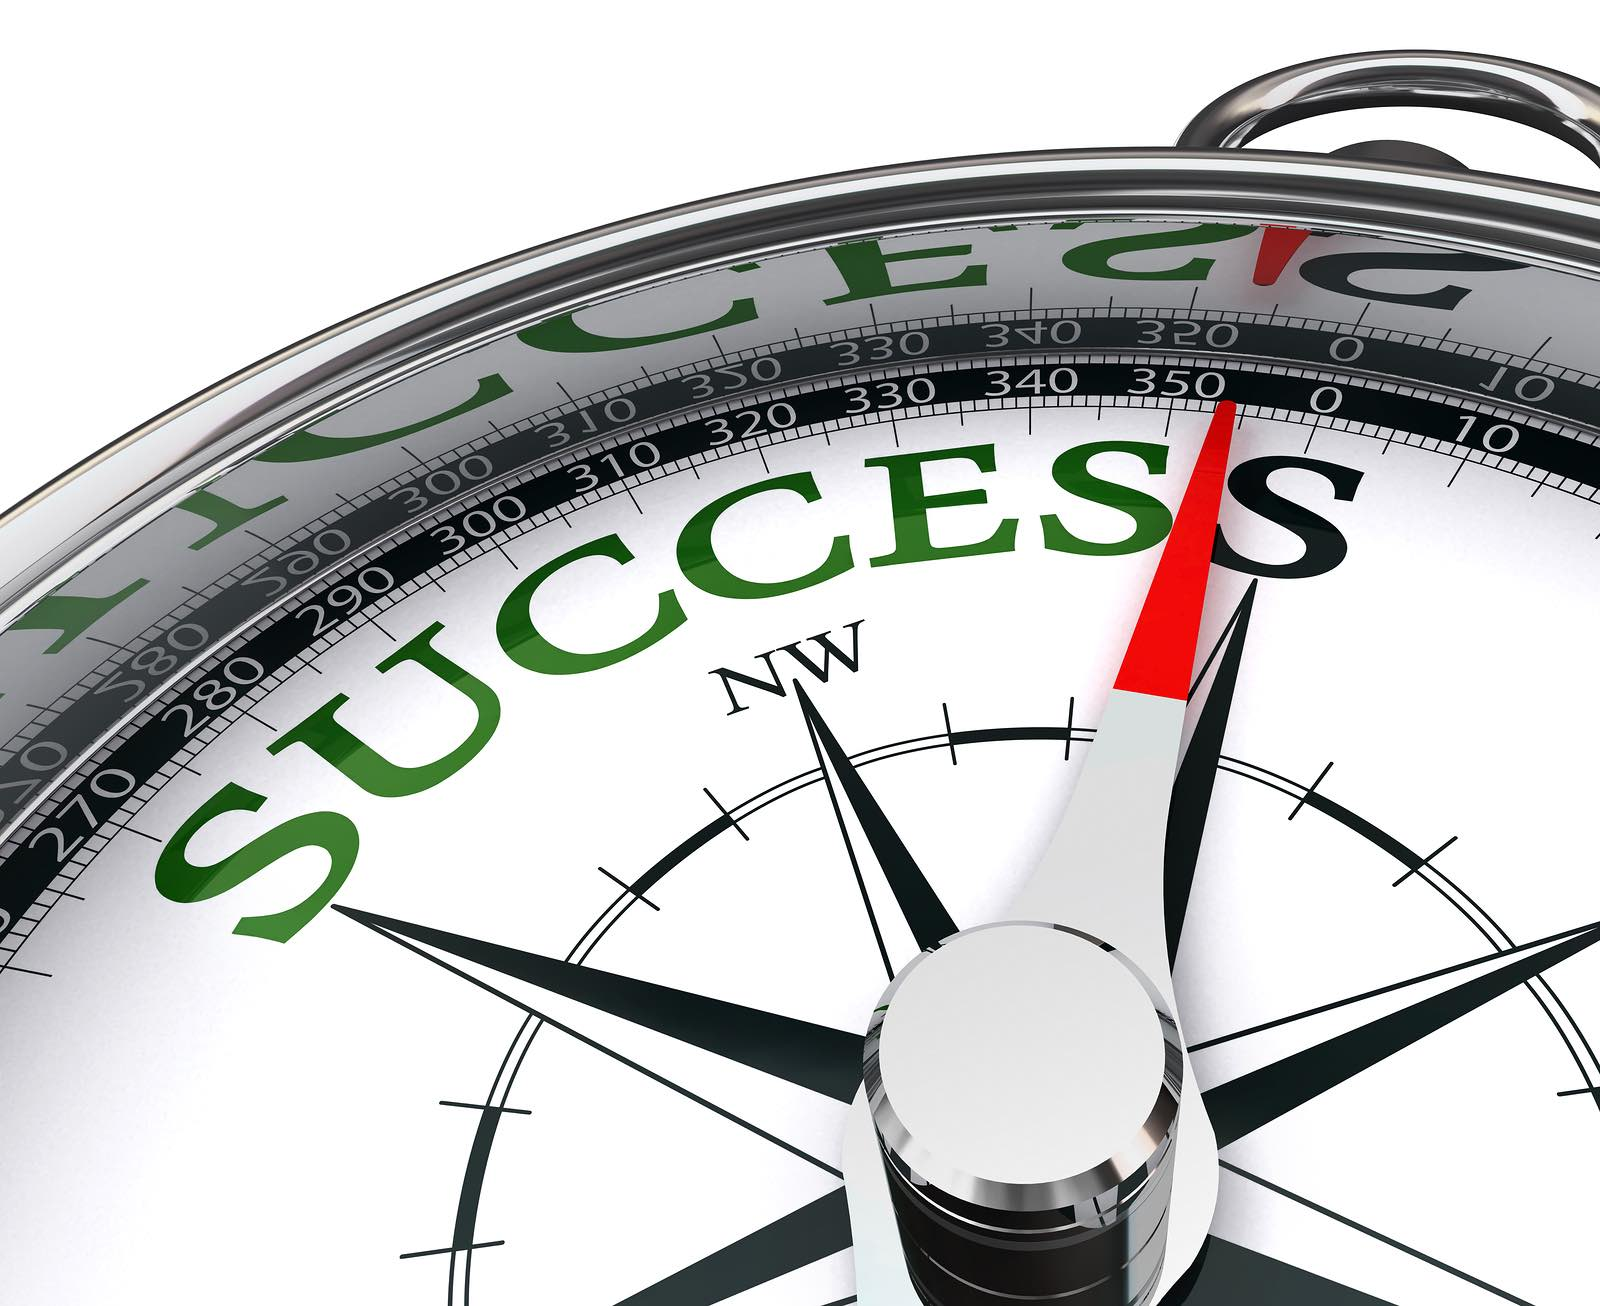 Success Compass Conceptual Image